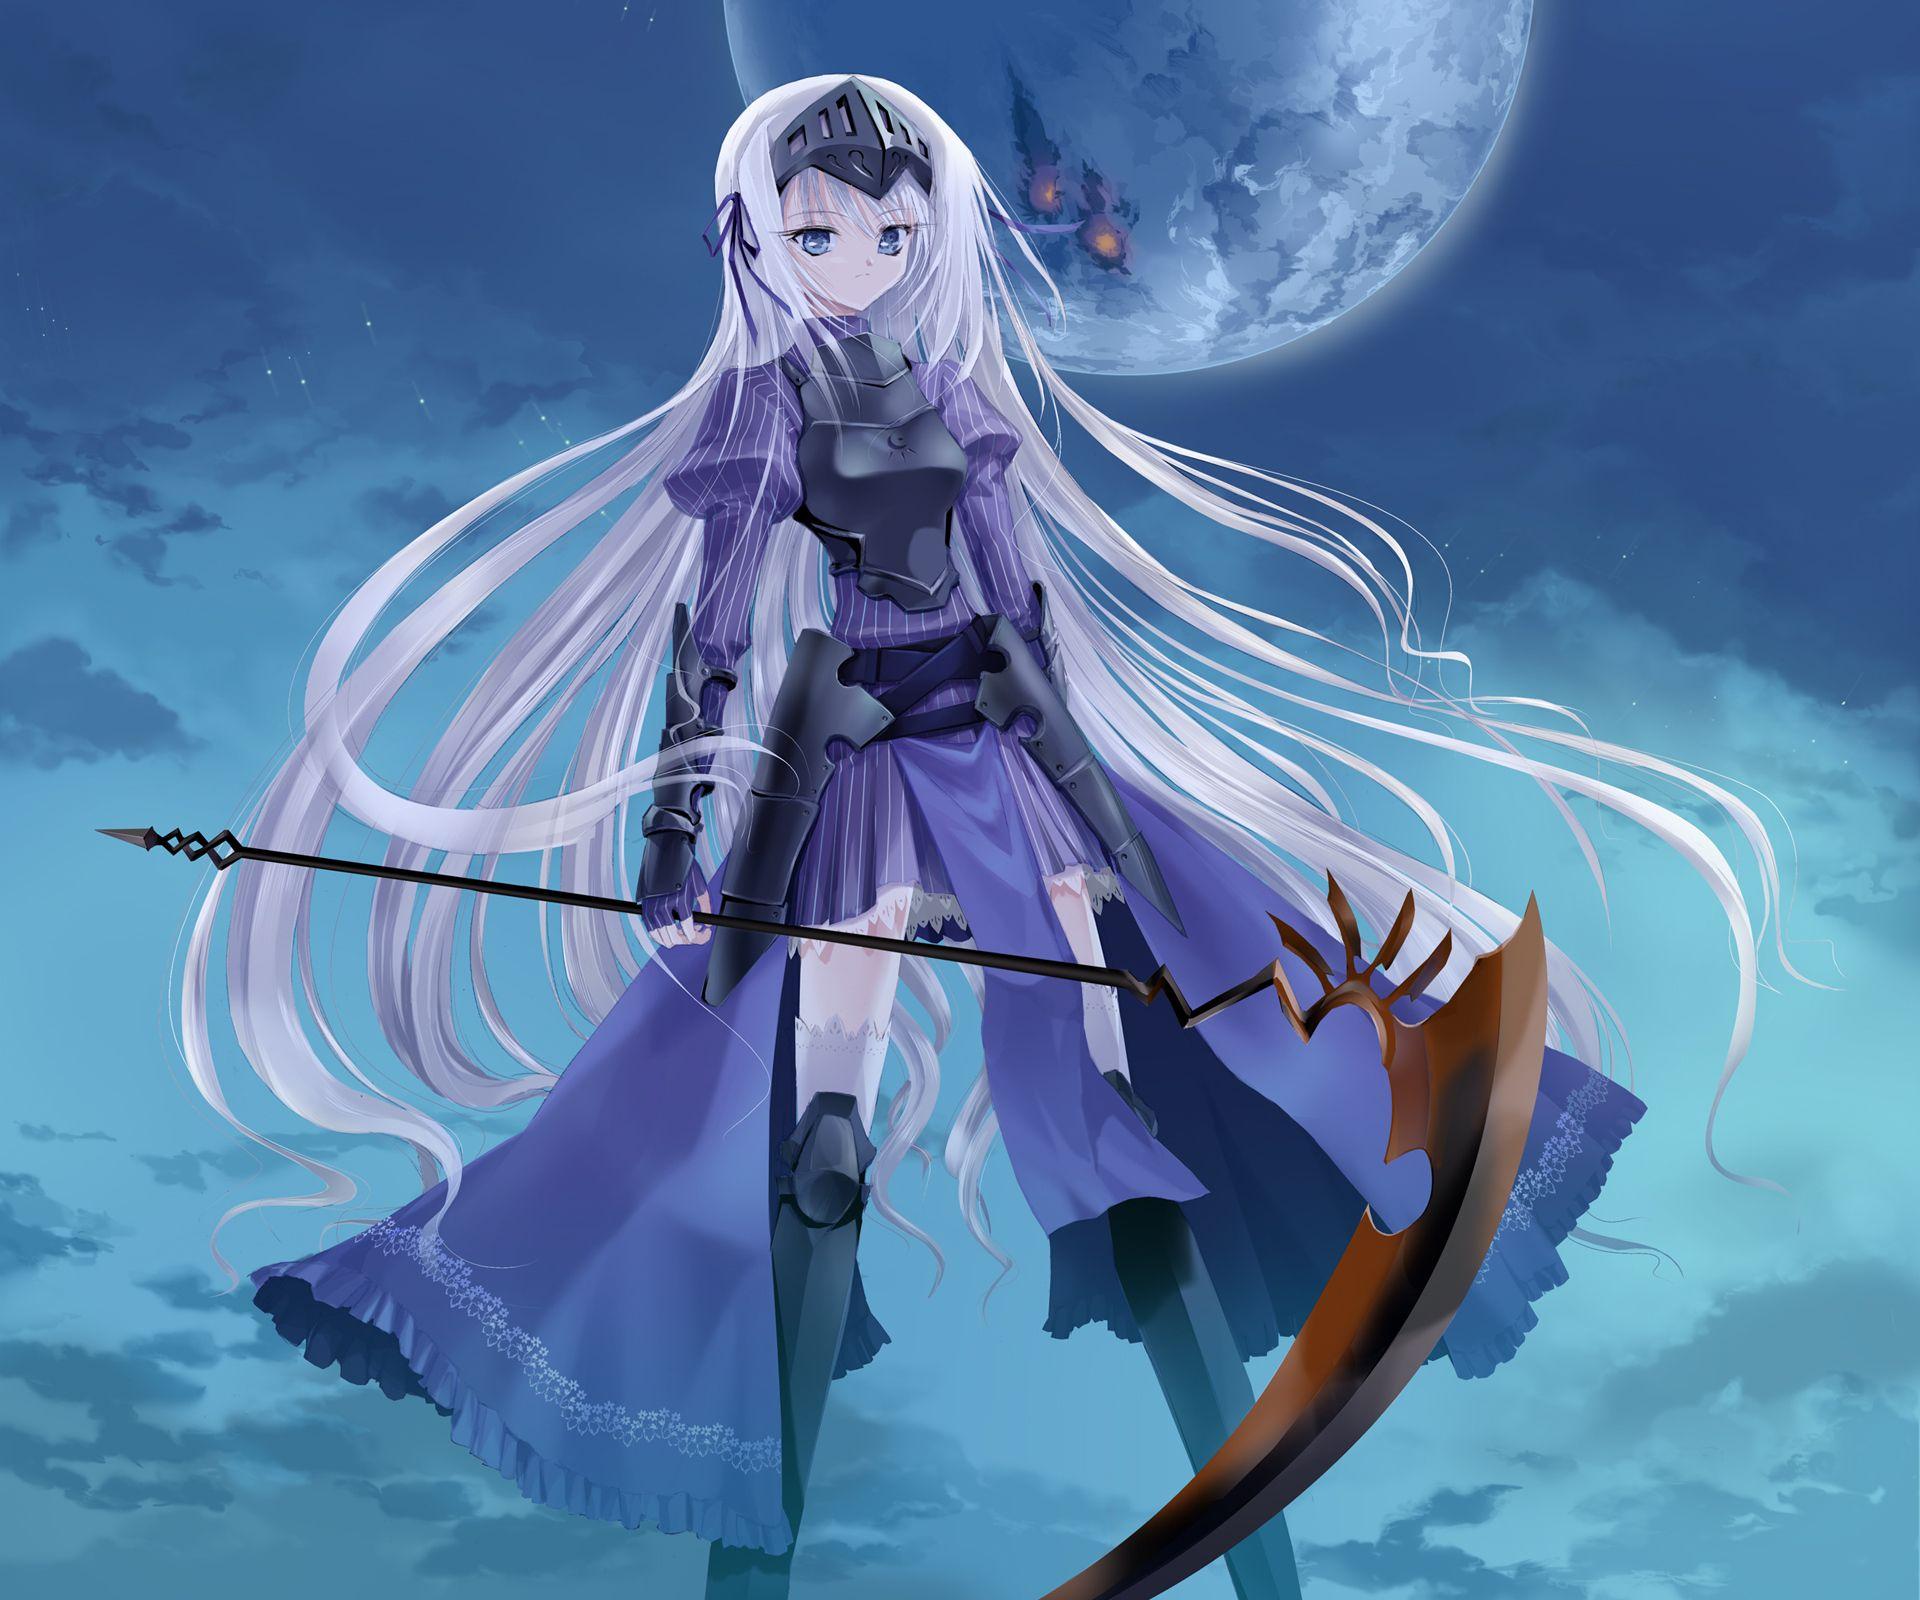 anime girl scythe Google Search Anime girl scythe